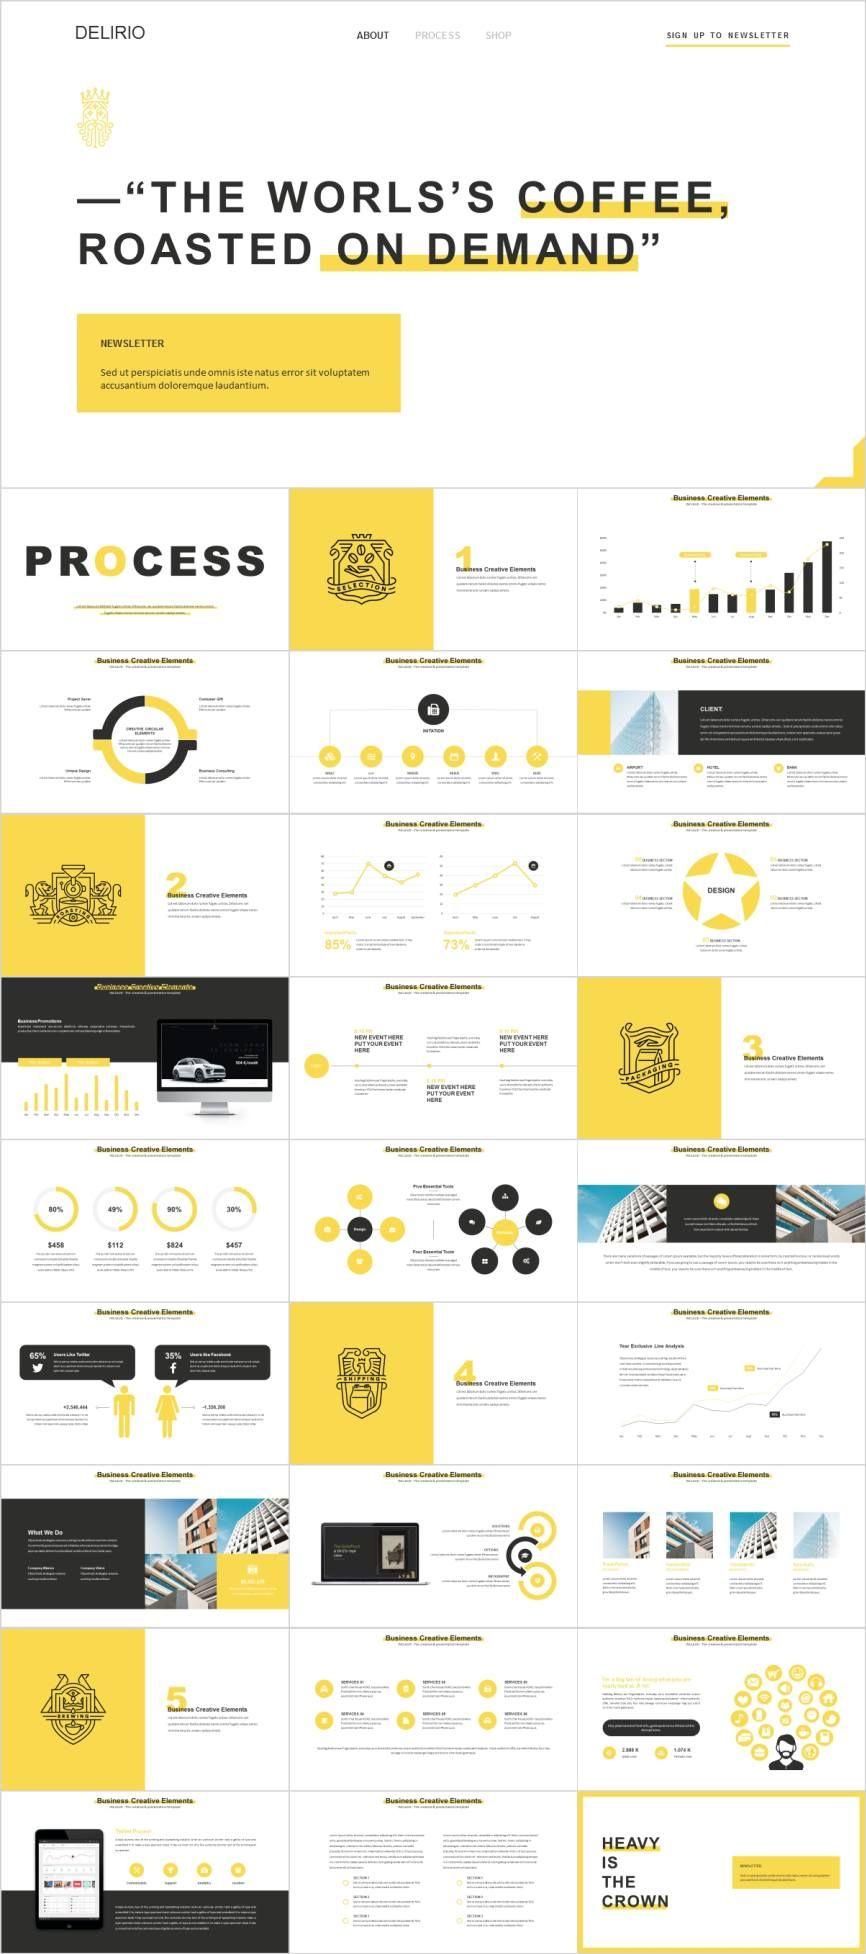 Yellow Website Analysis Powerpoint Template Pcslide Com Powerpoint Presentation Infographic Ppt Powerpoint Templates Website Analysis Presentation Design